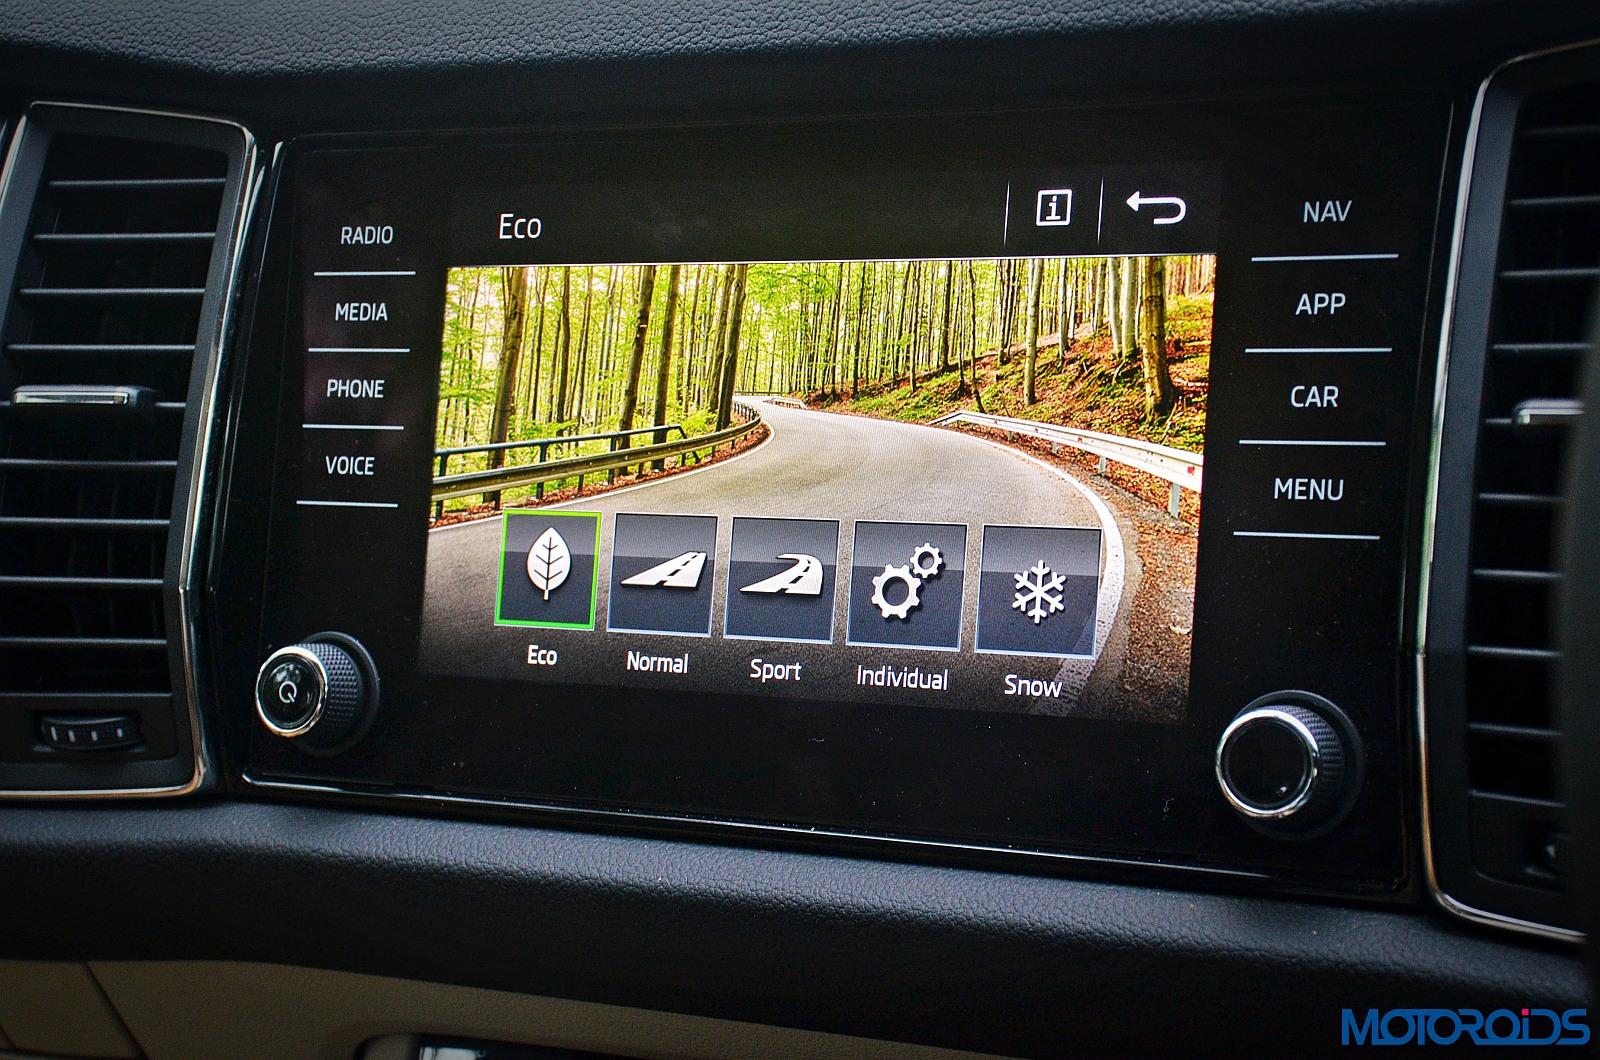 Skoda-Kodiaq-driving-modes